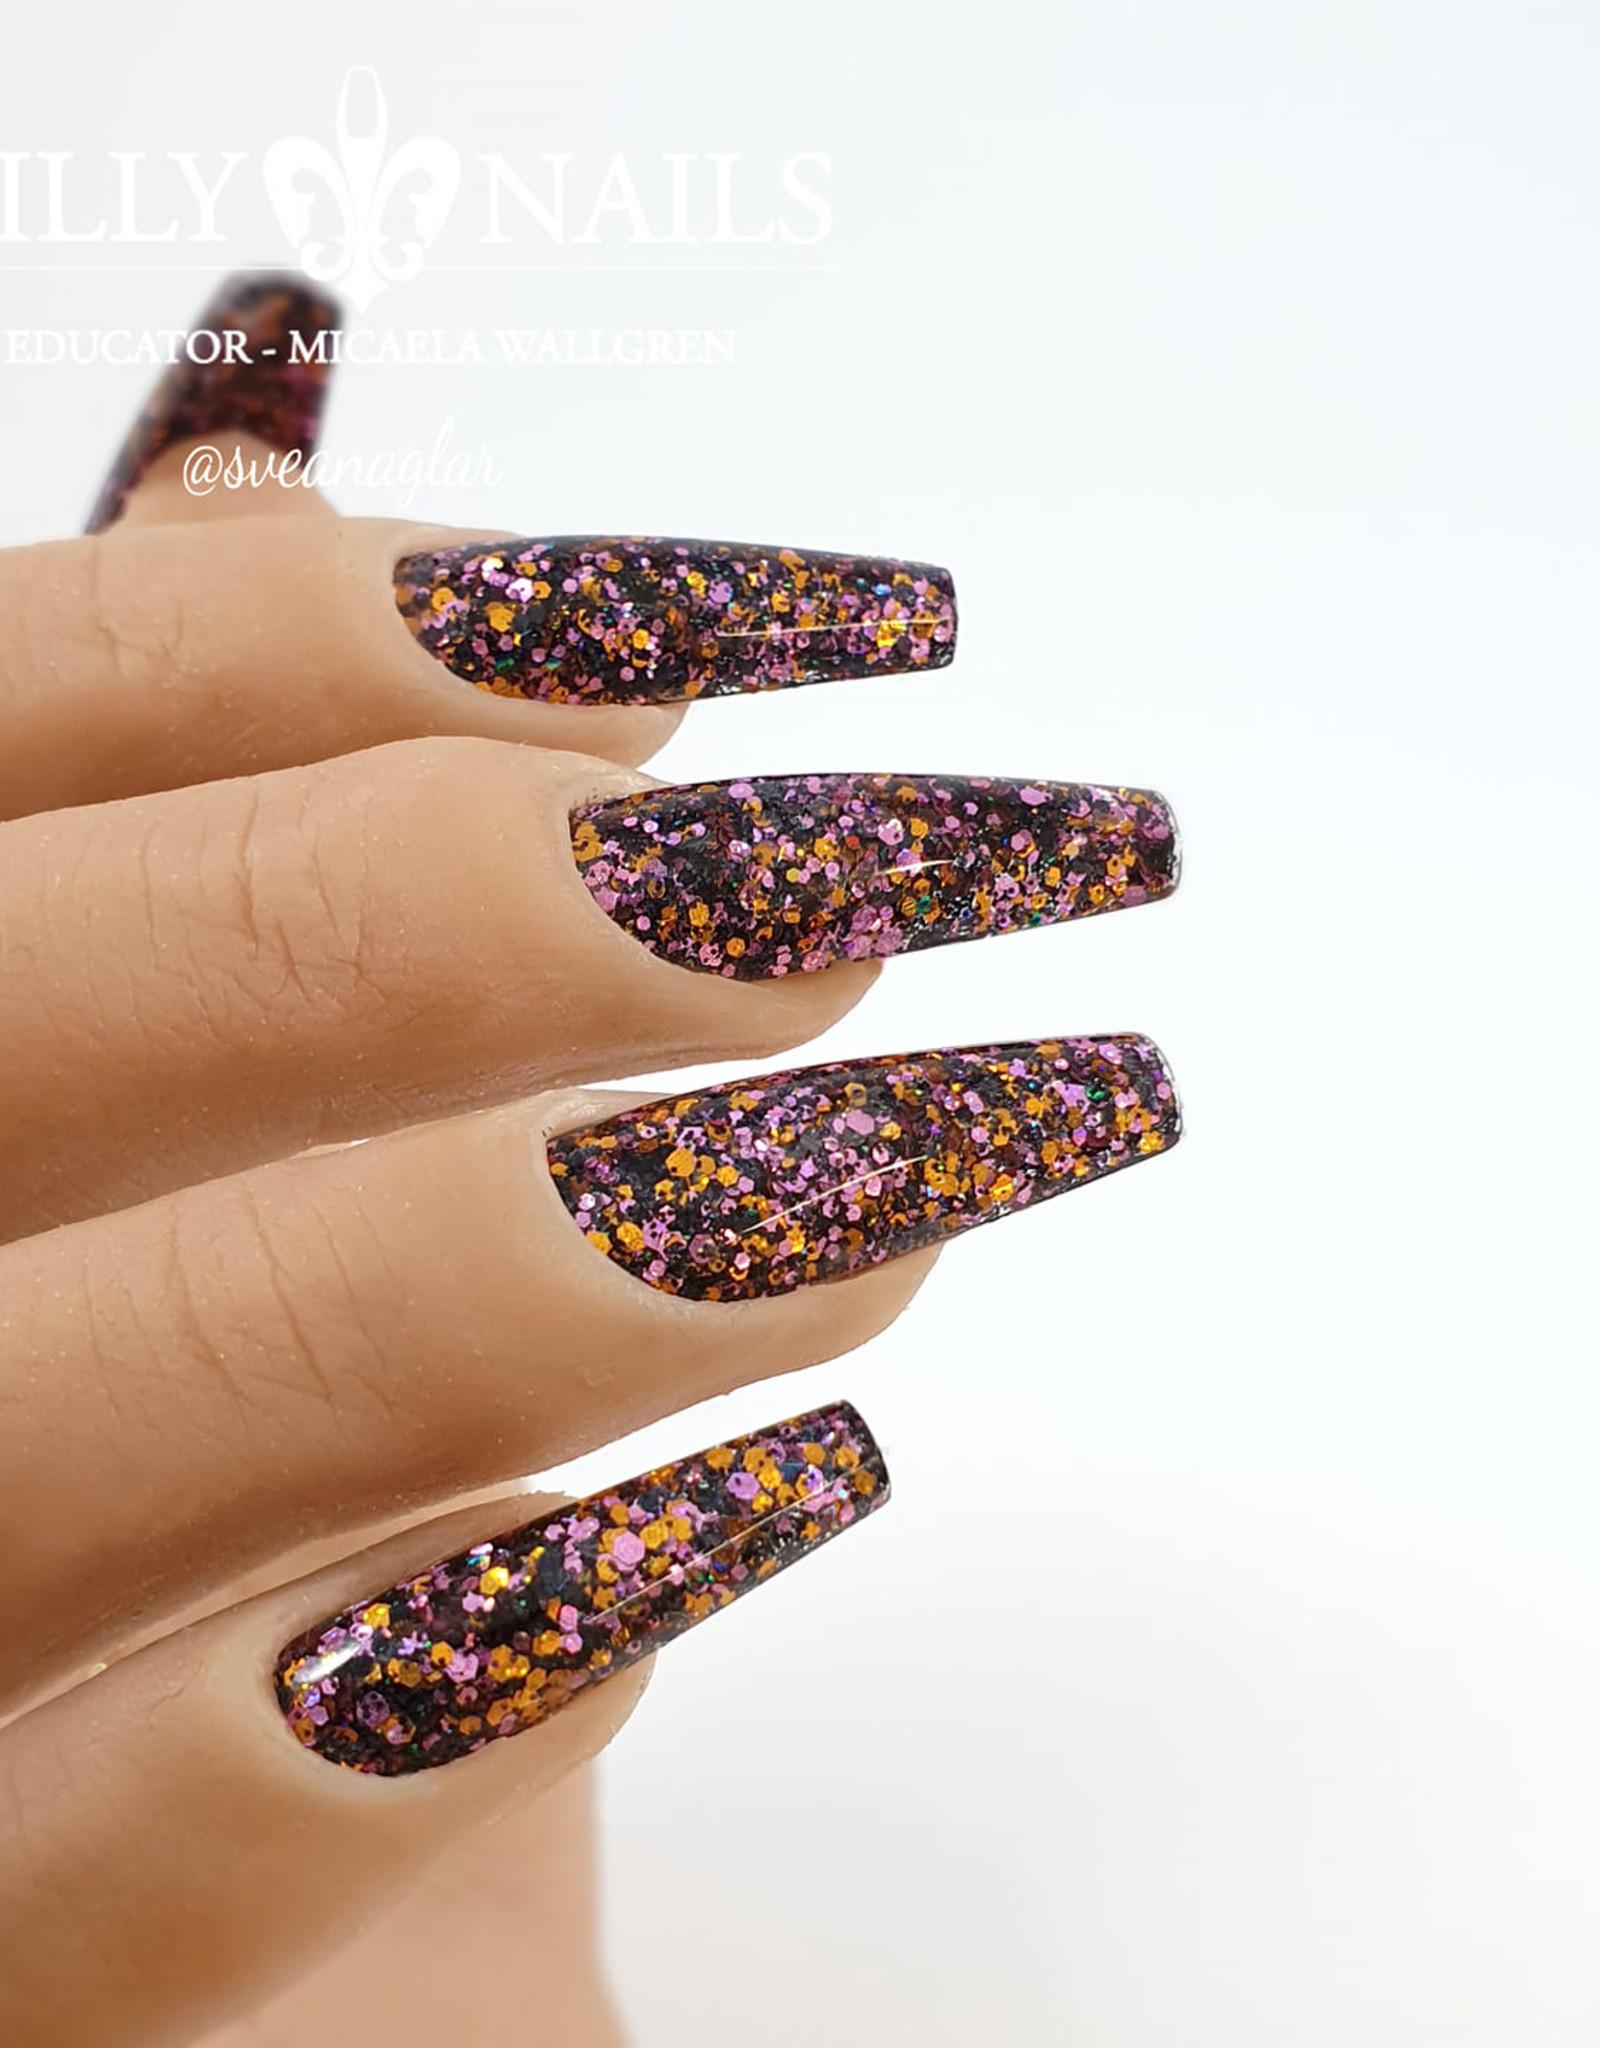 Glittermix, Witches